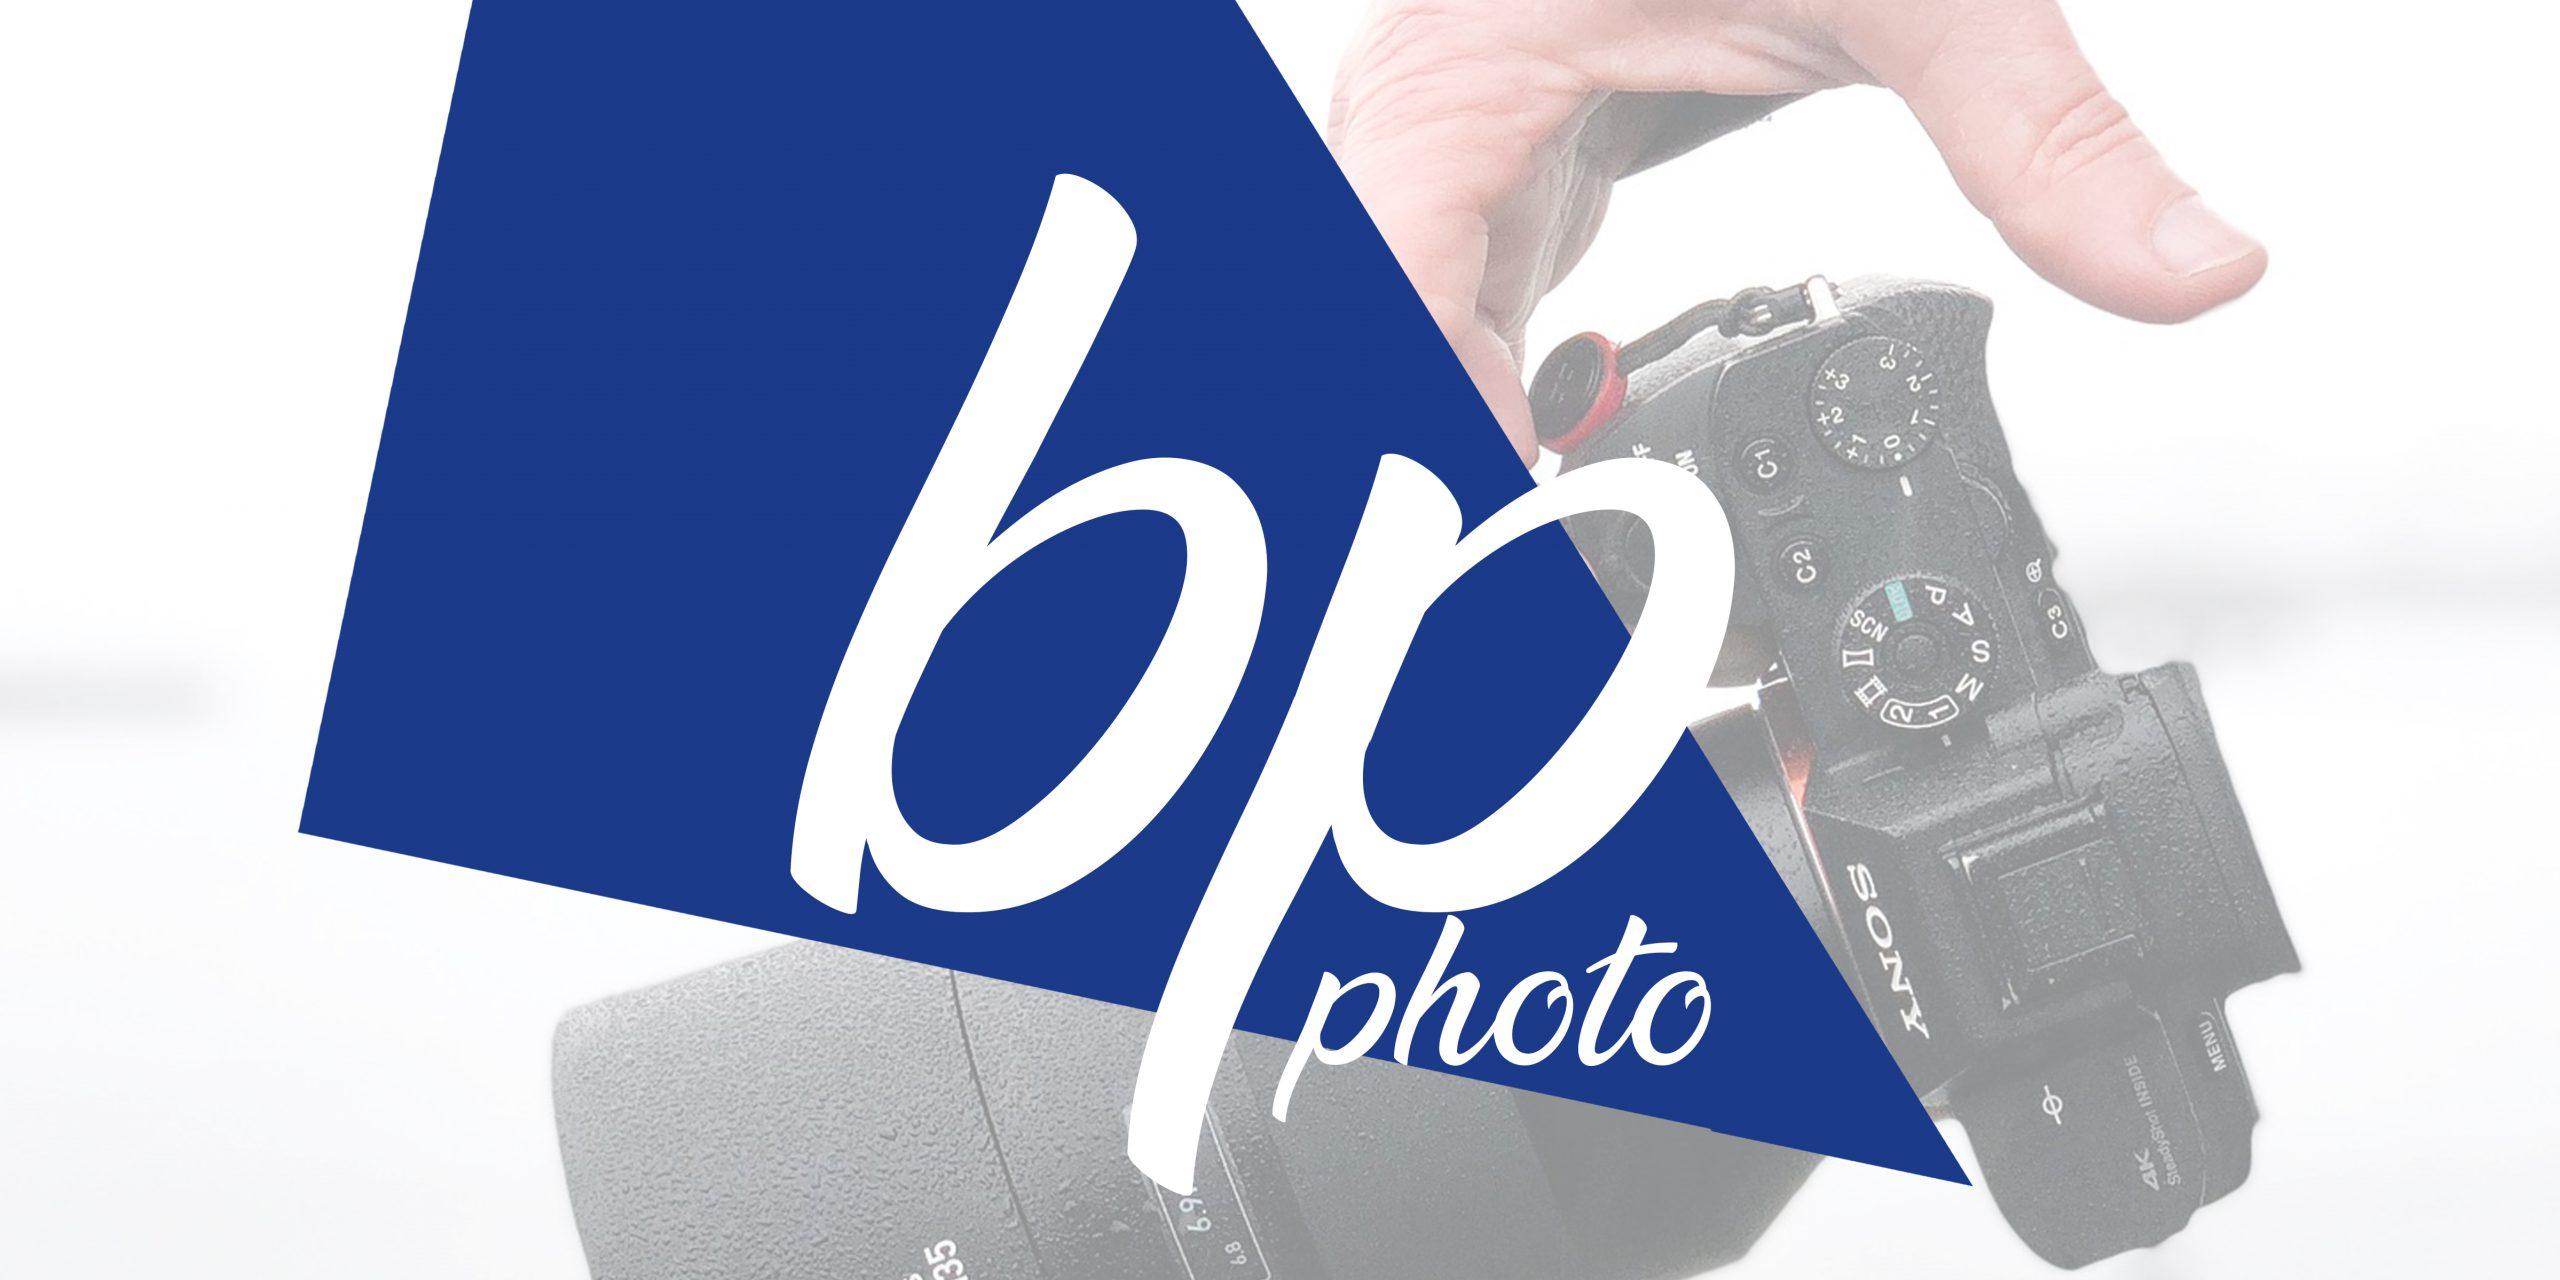 photographe videaste bruno persico